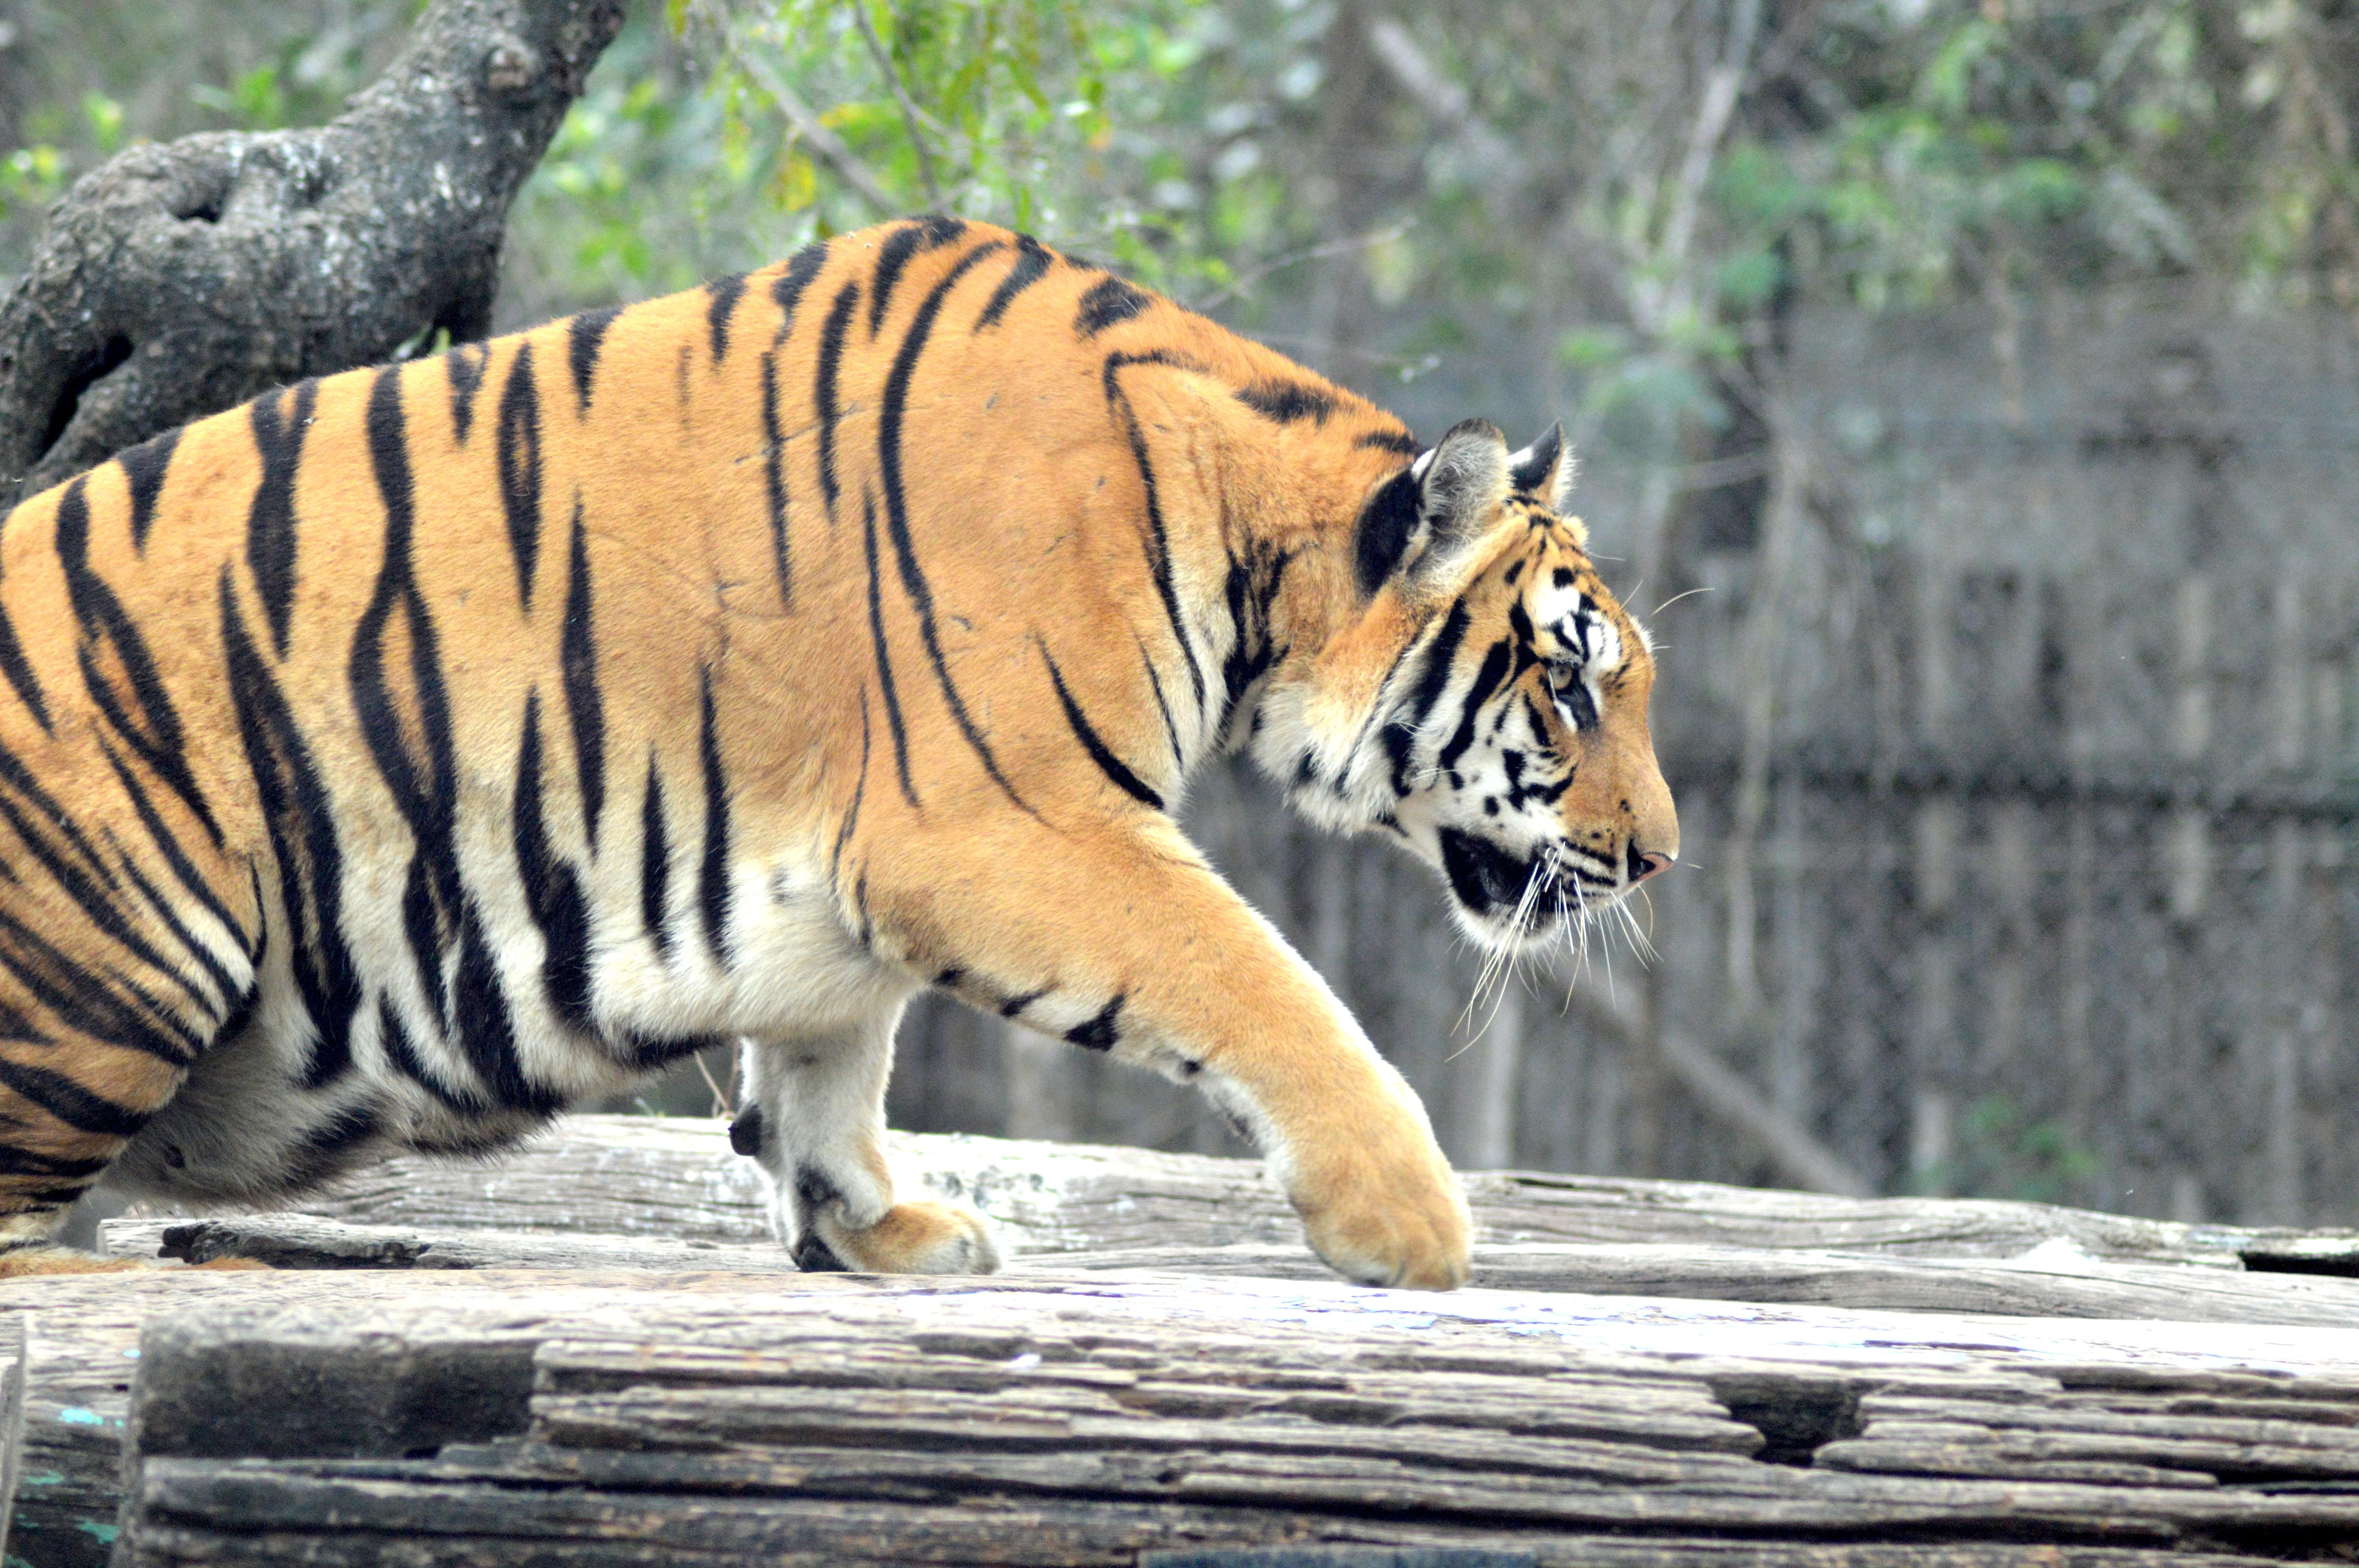 Brown Tiger, Animal, Nature, Wood, Wildlife, HQ Photo